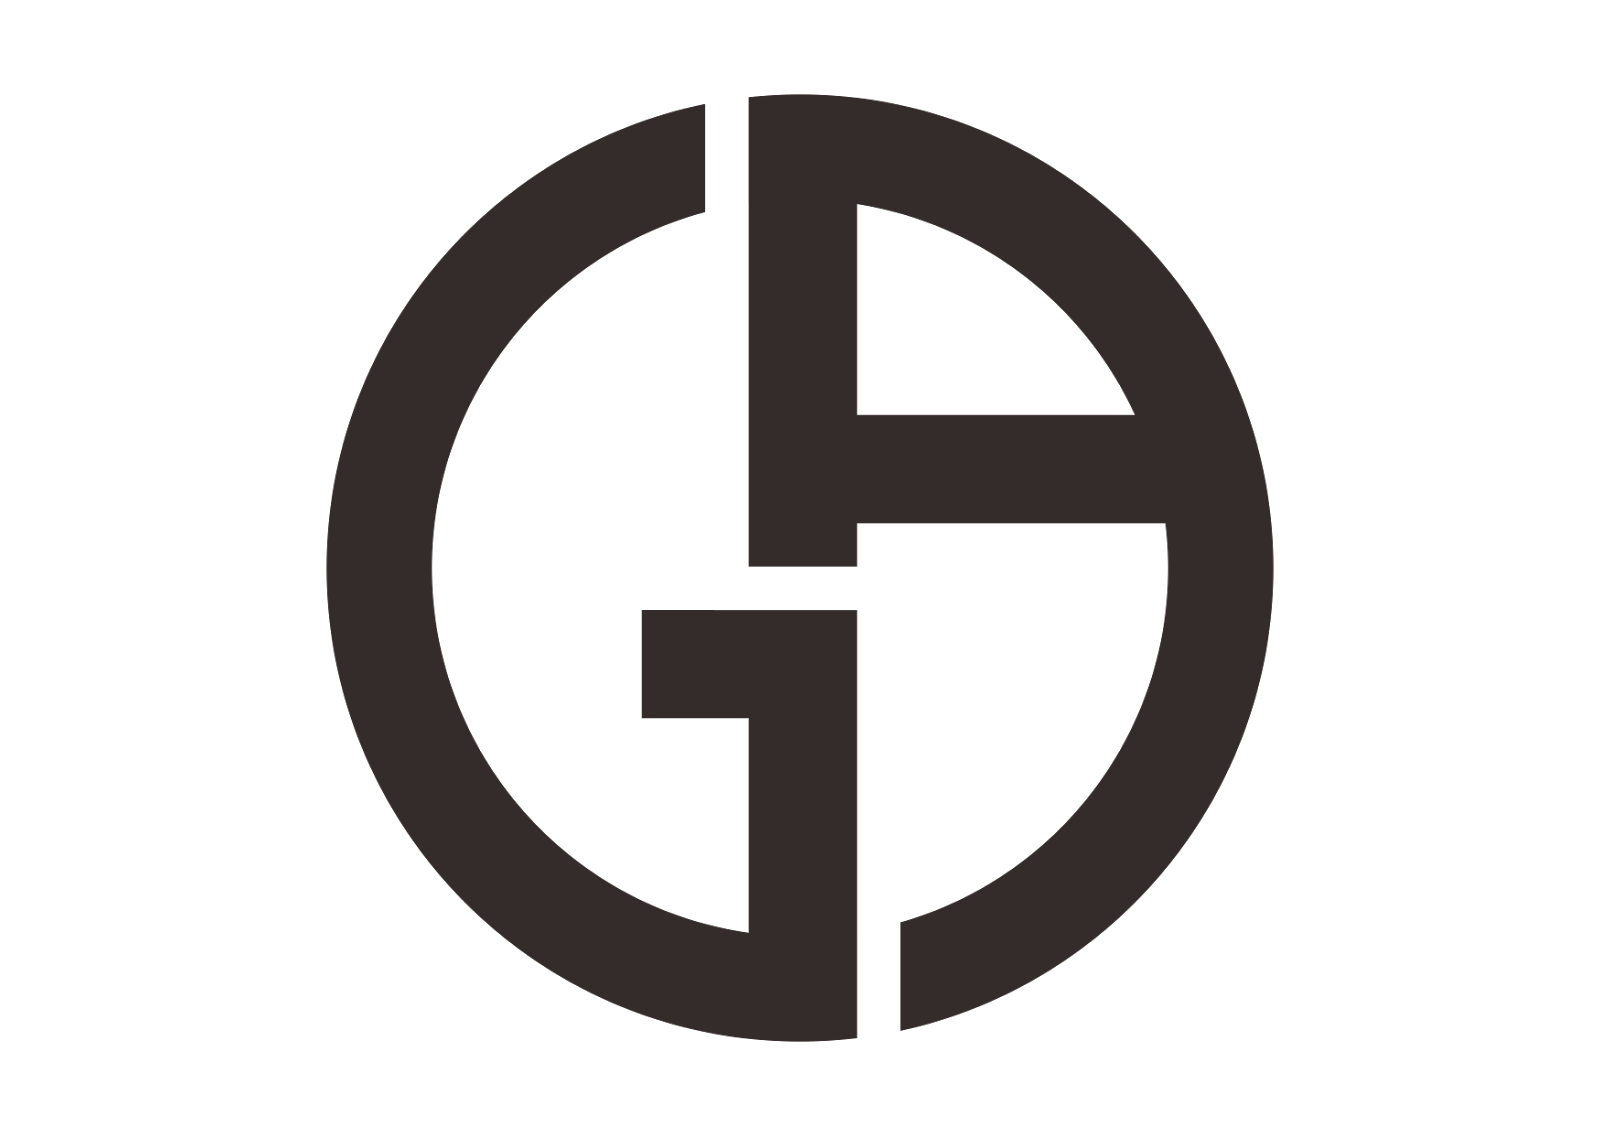 Giorgio Armani Logo Vector~ Format Cdr, Ai, Eps, Svg, PDF, PNG